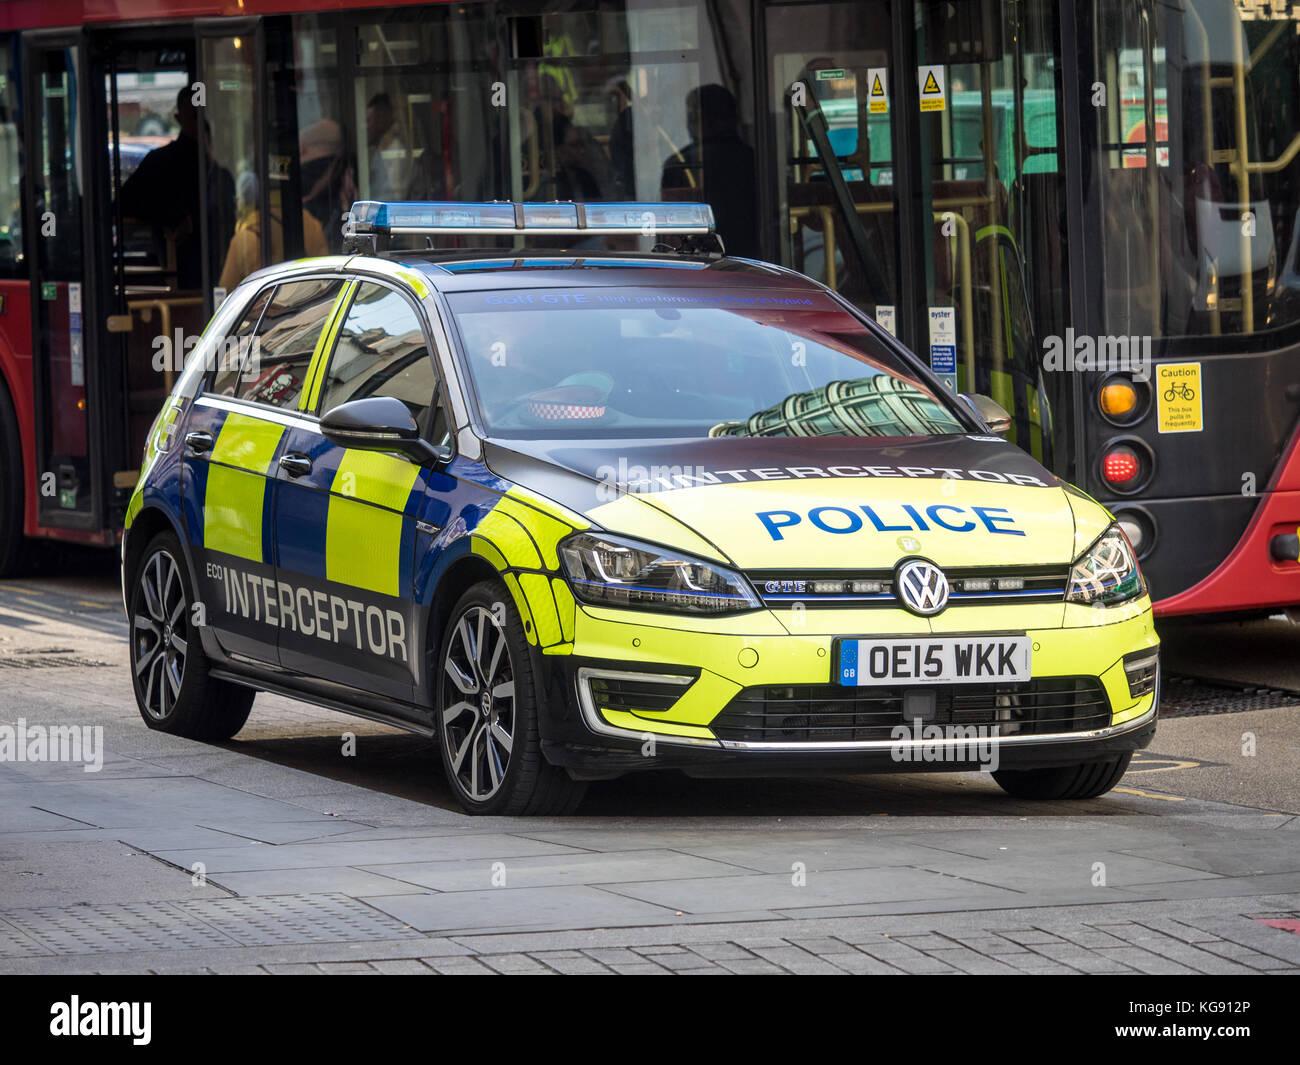 Eco Police Interceptor Car - City of London Police using a VW GTE Hybrid  as fast response interceptor - Stock Image